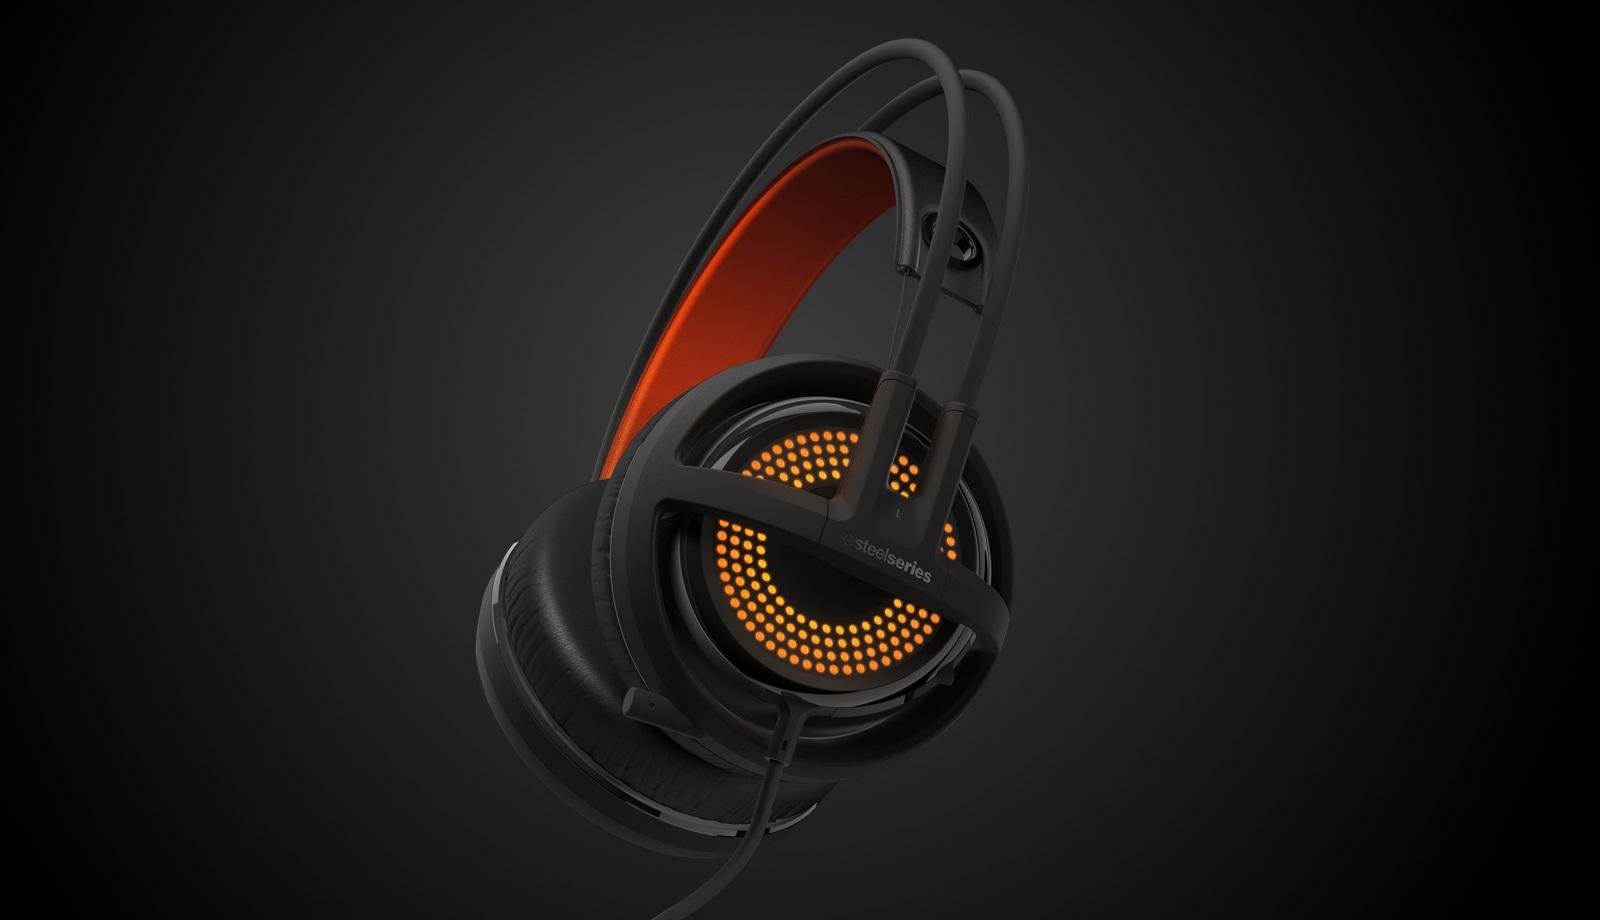 review steelseries siberia 350 usb headset. Black Bedroom Furniture Sets. Home Design Ideas